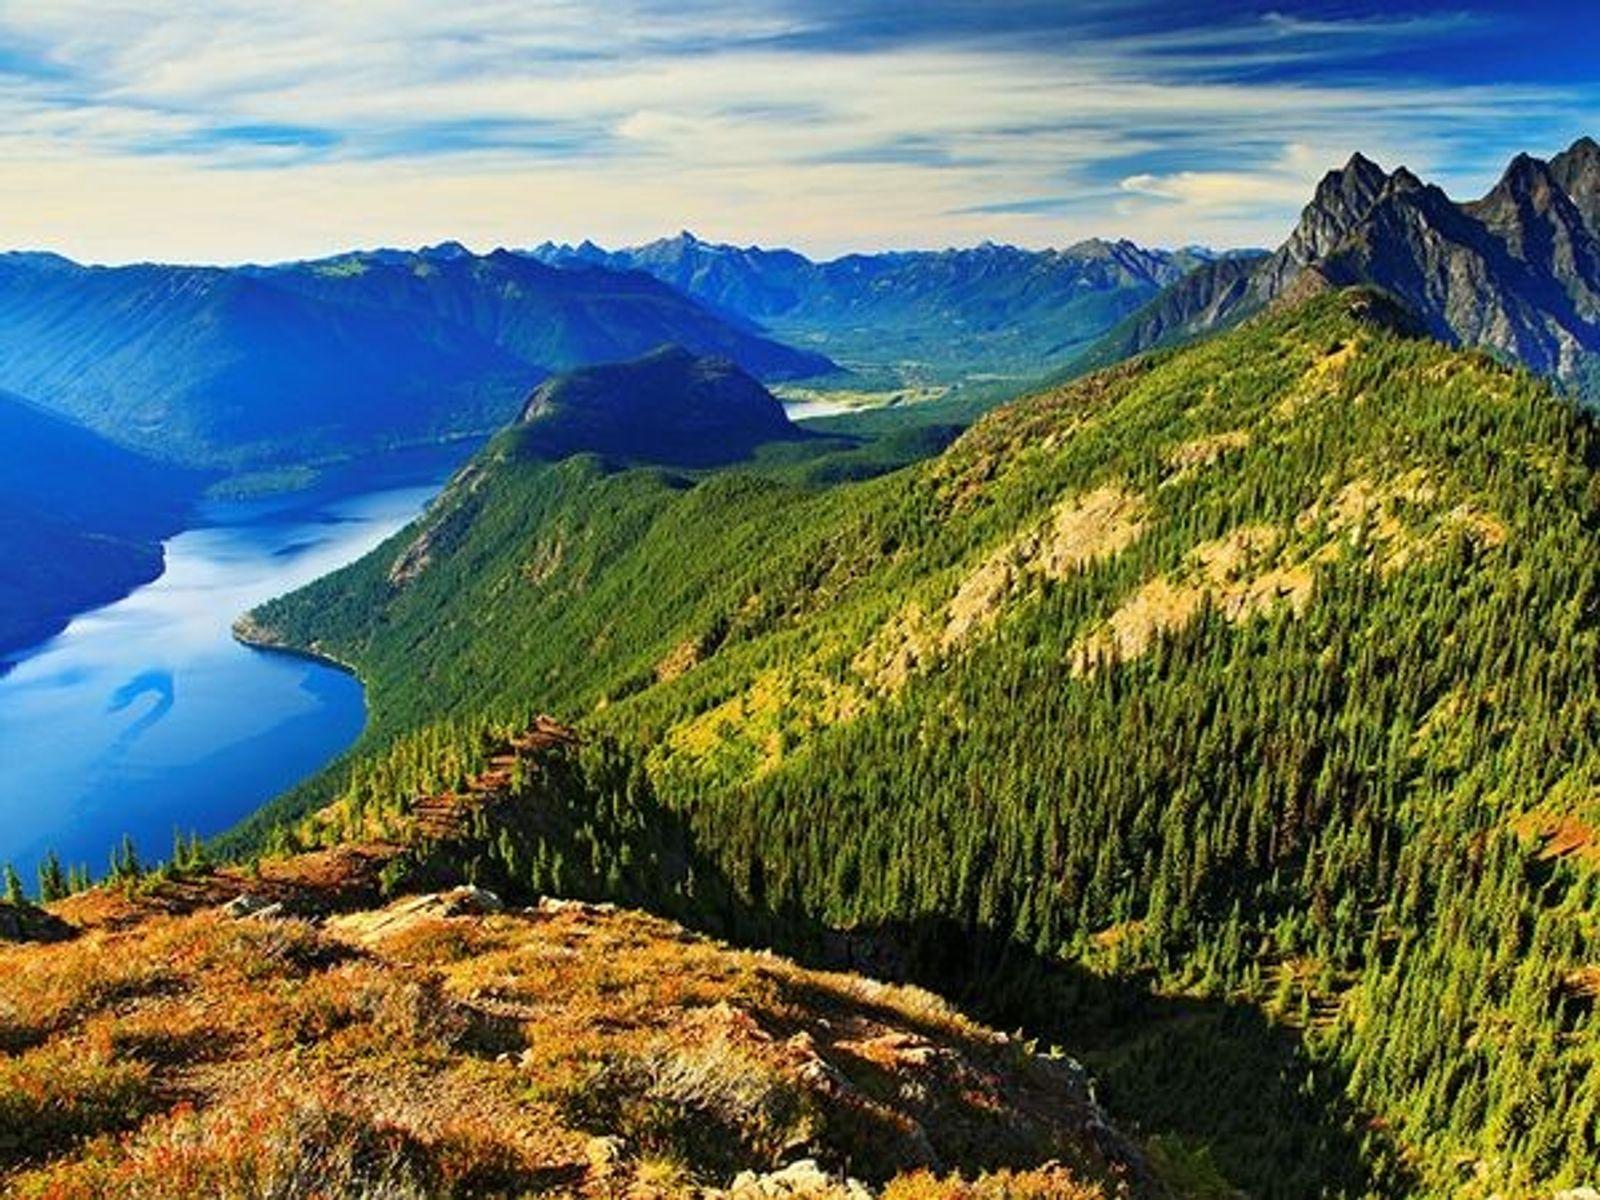 Desolation Peak, Washington, USA